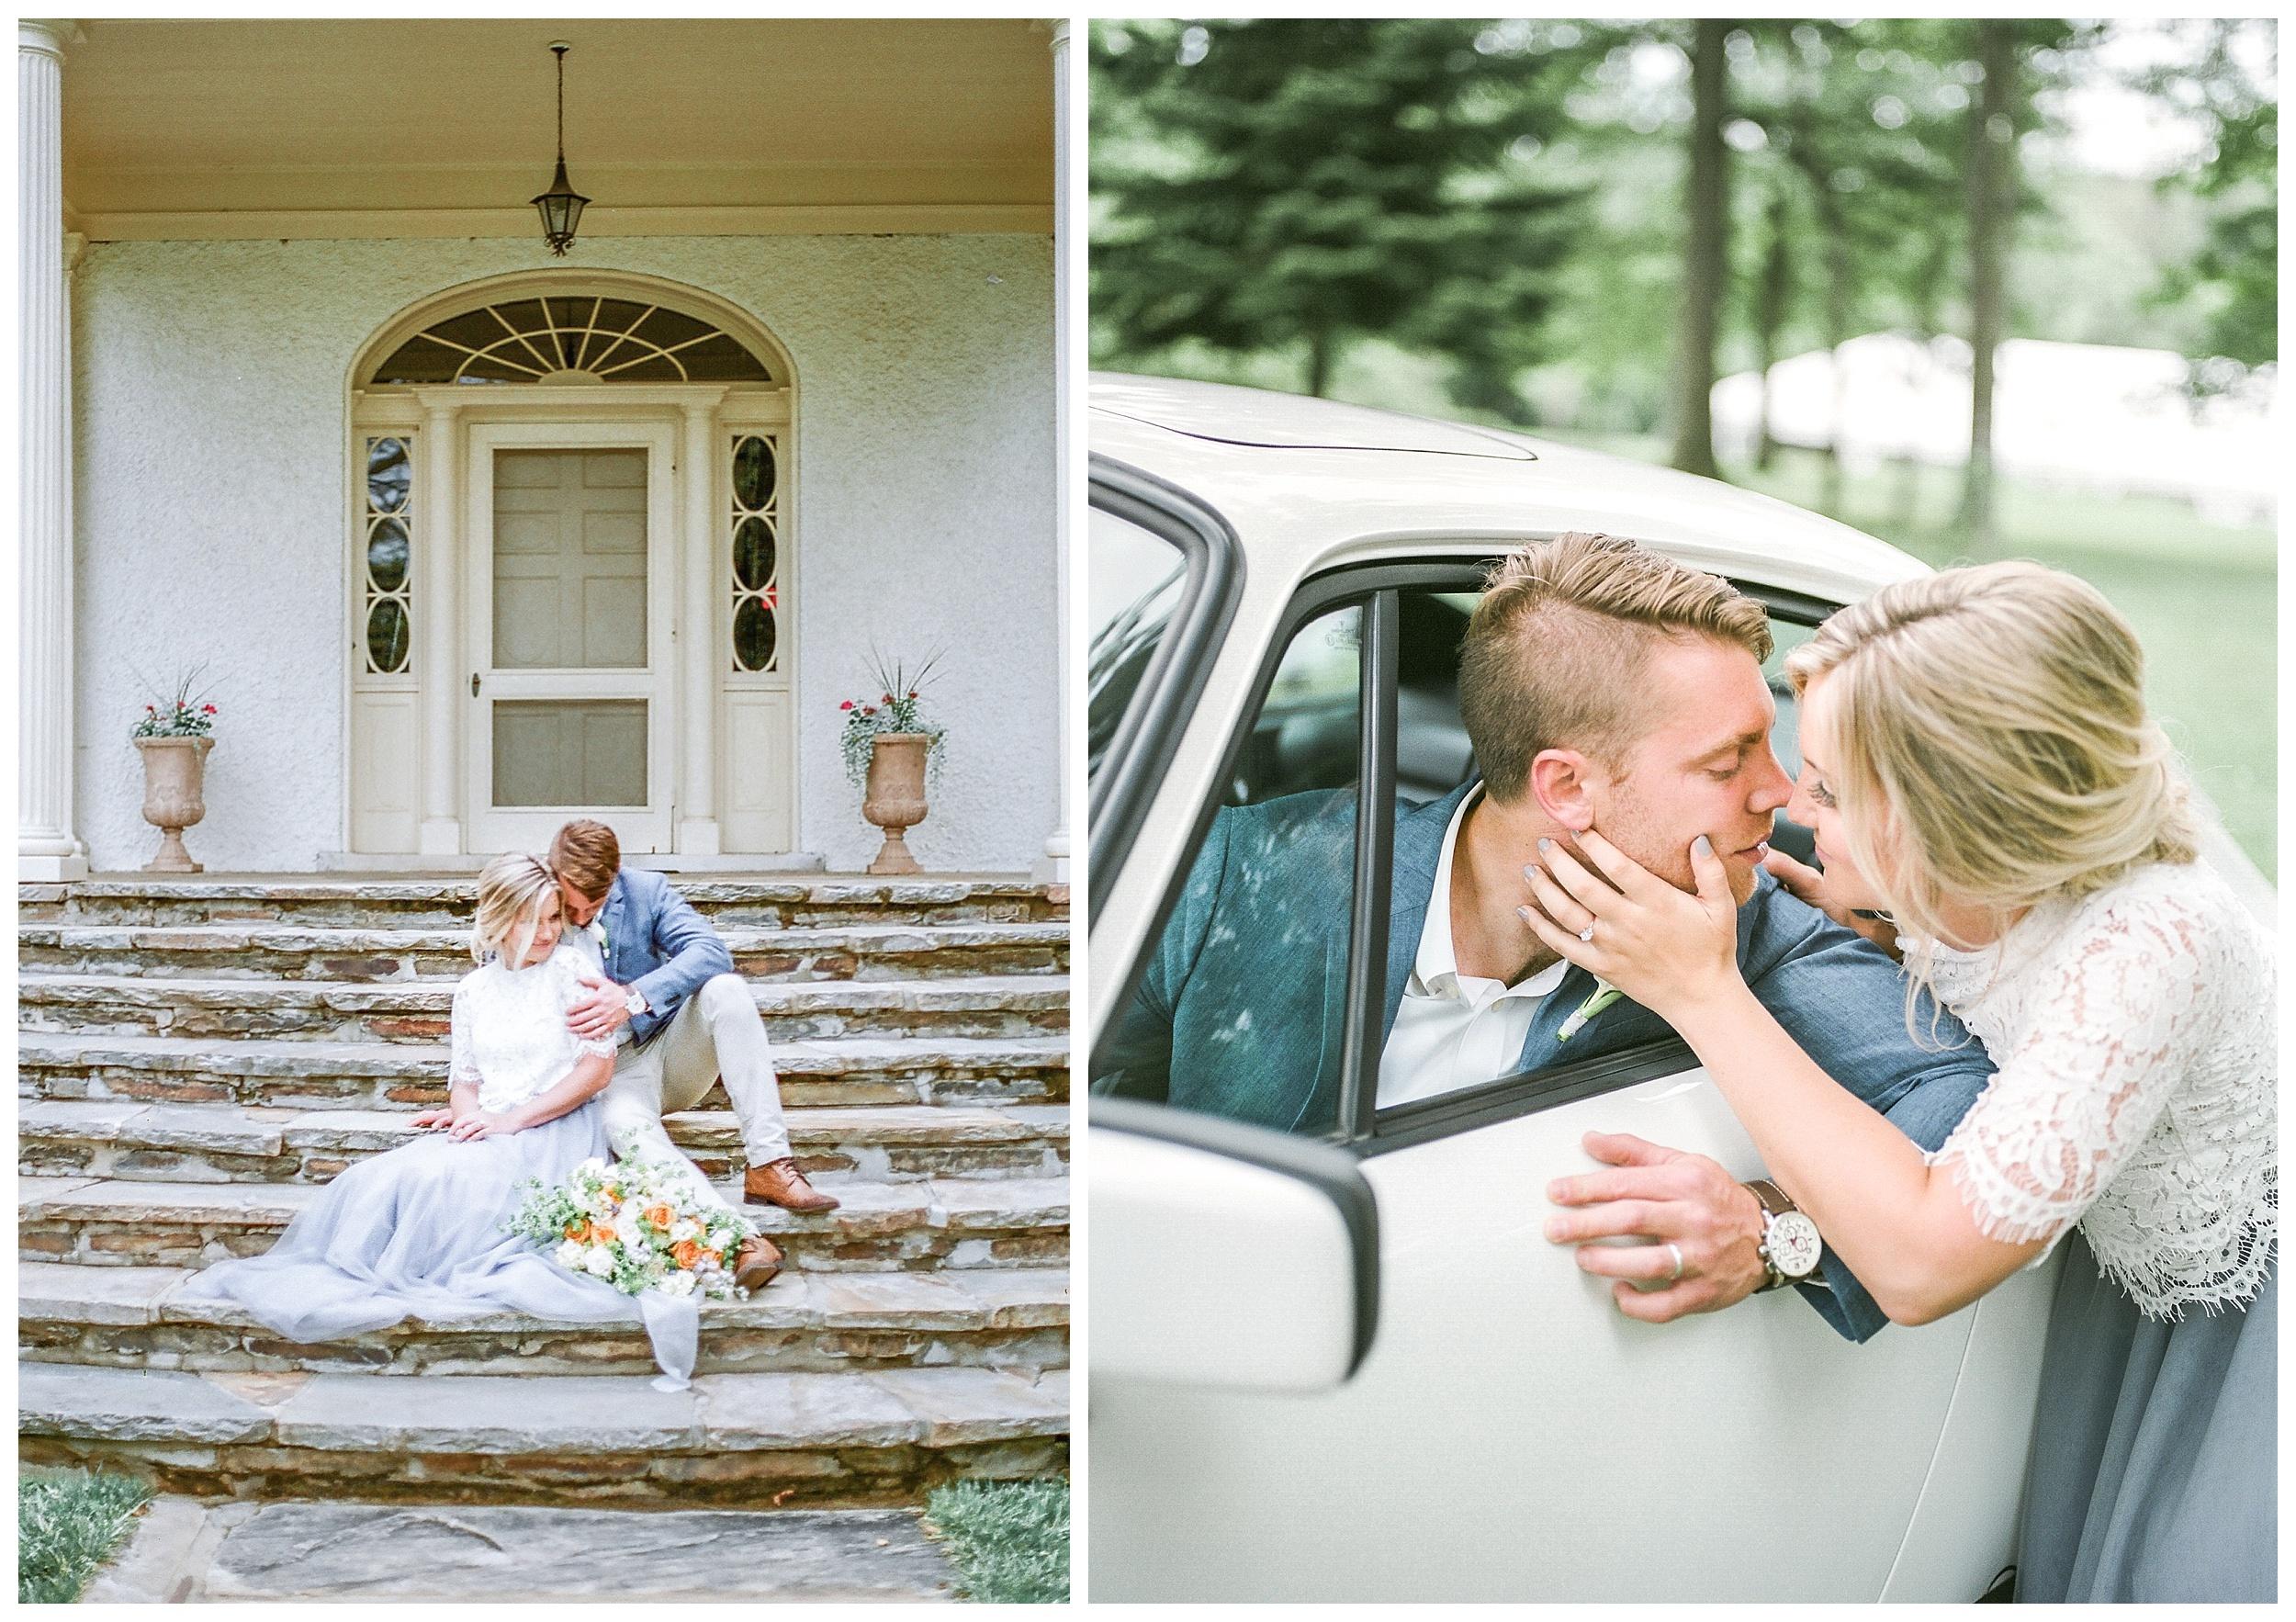 Rust Manor Wedding   Virginia Wedding Photographer Kir Tuben_0025.jpg